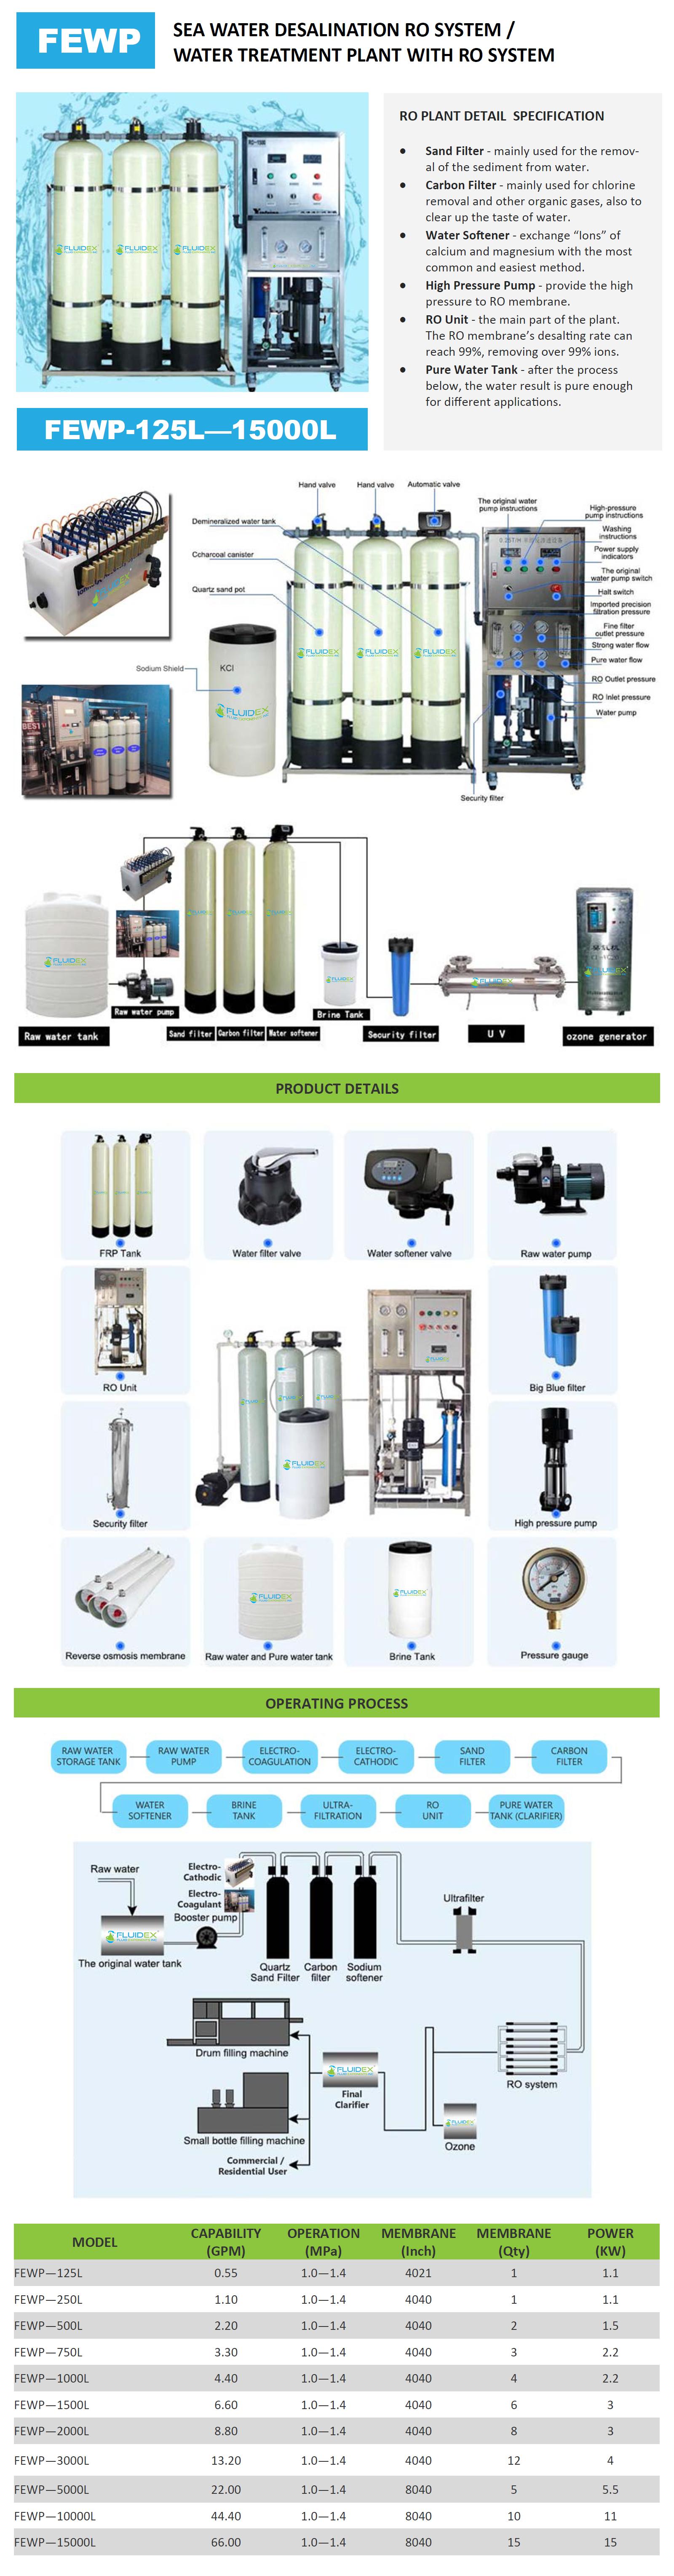 Desalination RO Fluid Exponents Inc